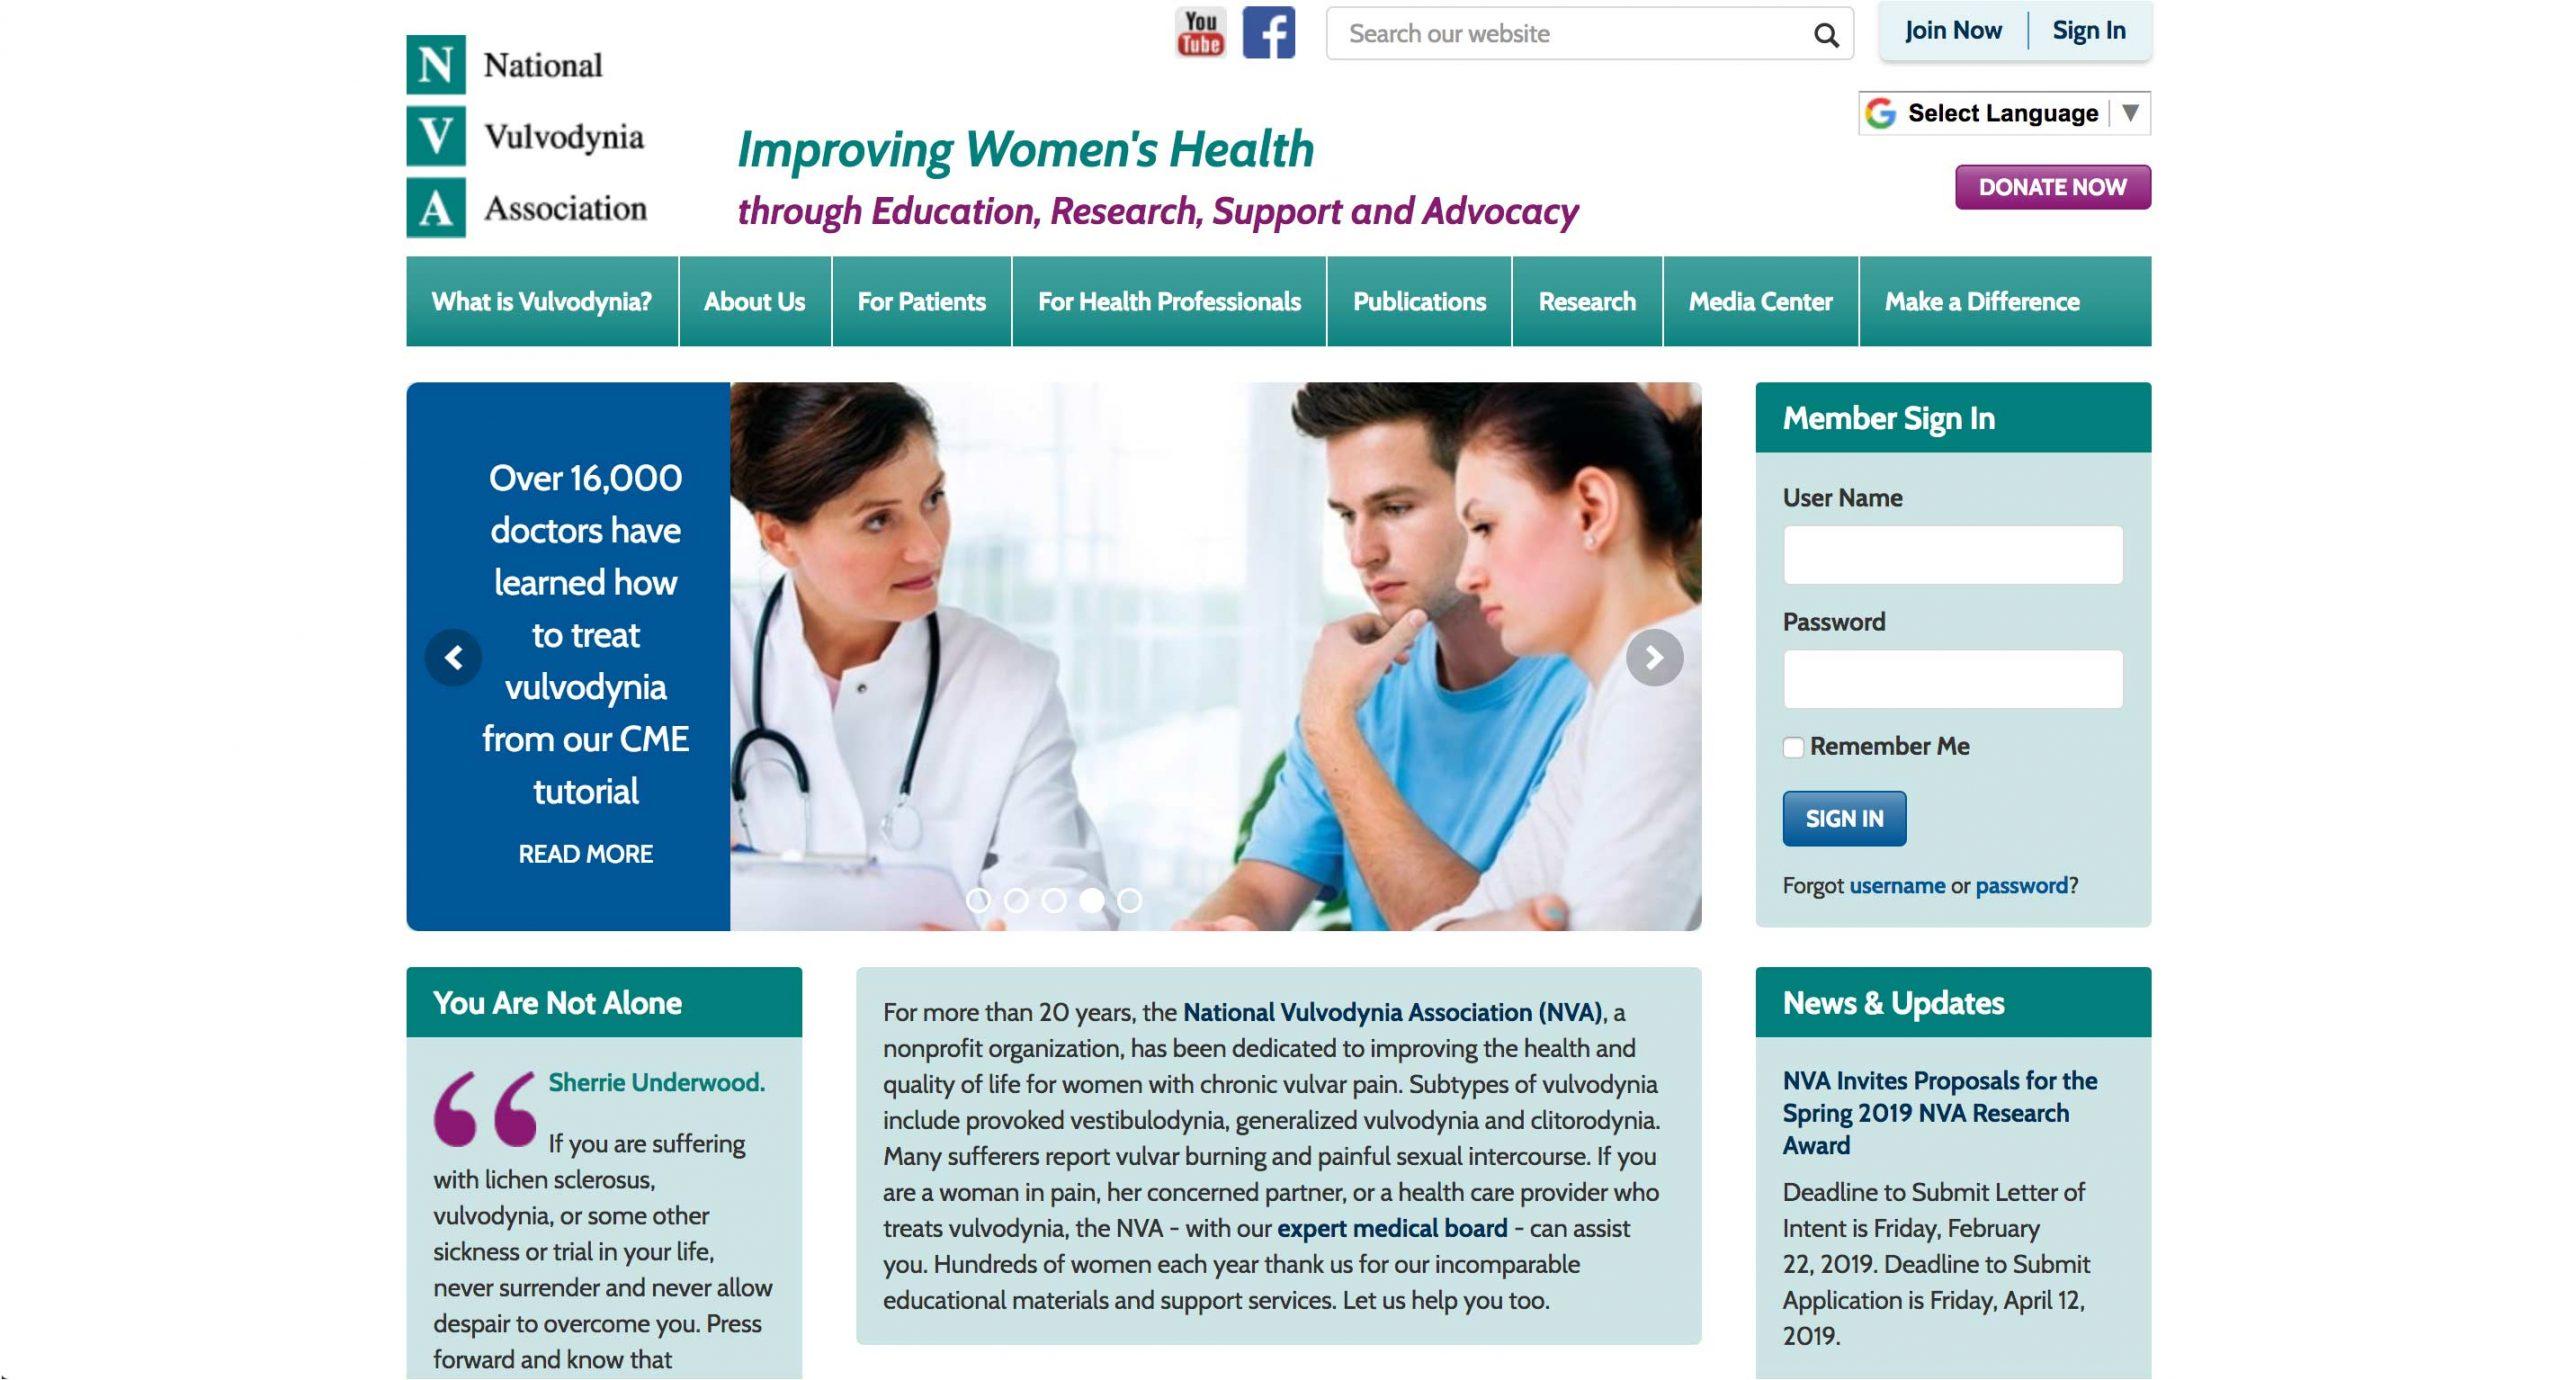 NVA - National Vulvodynia Association - Home Page